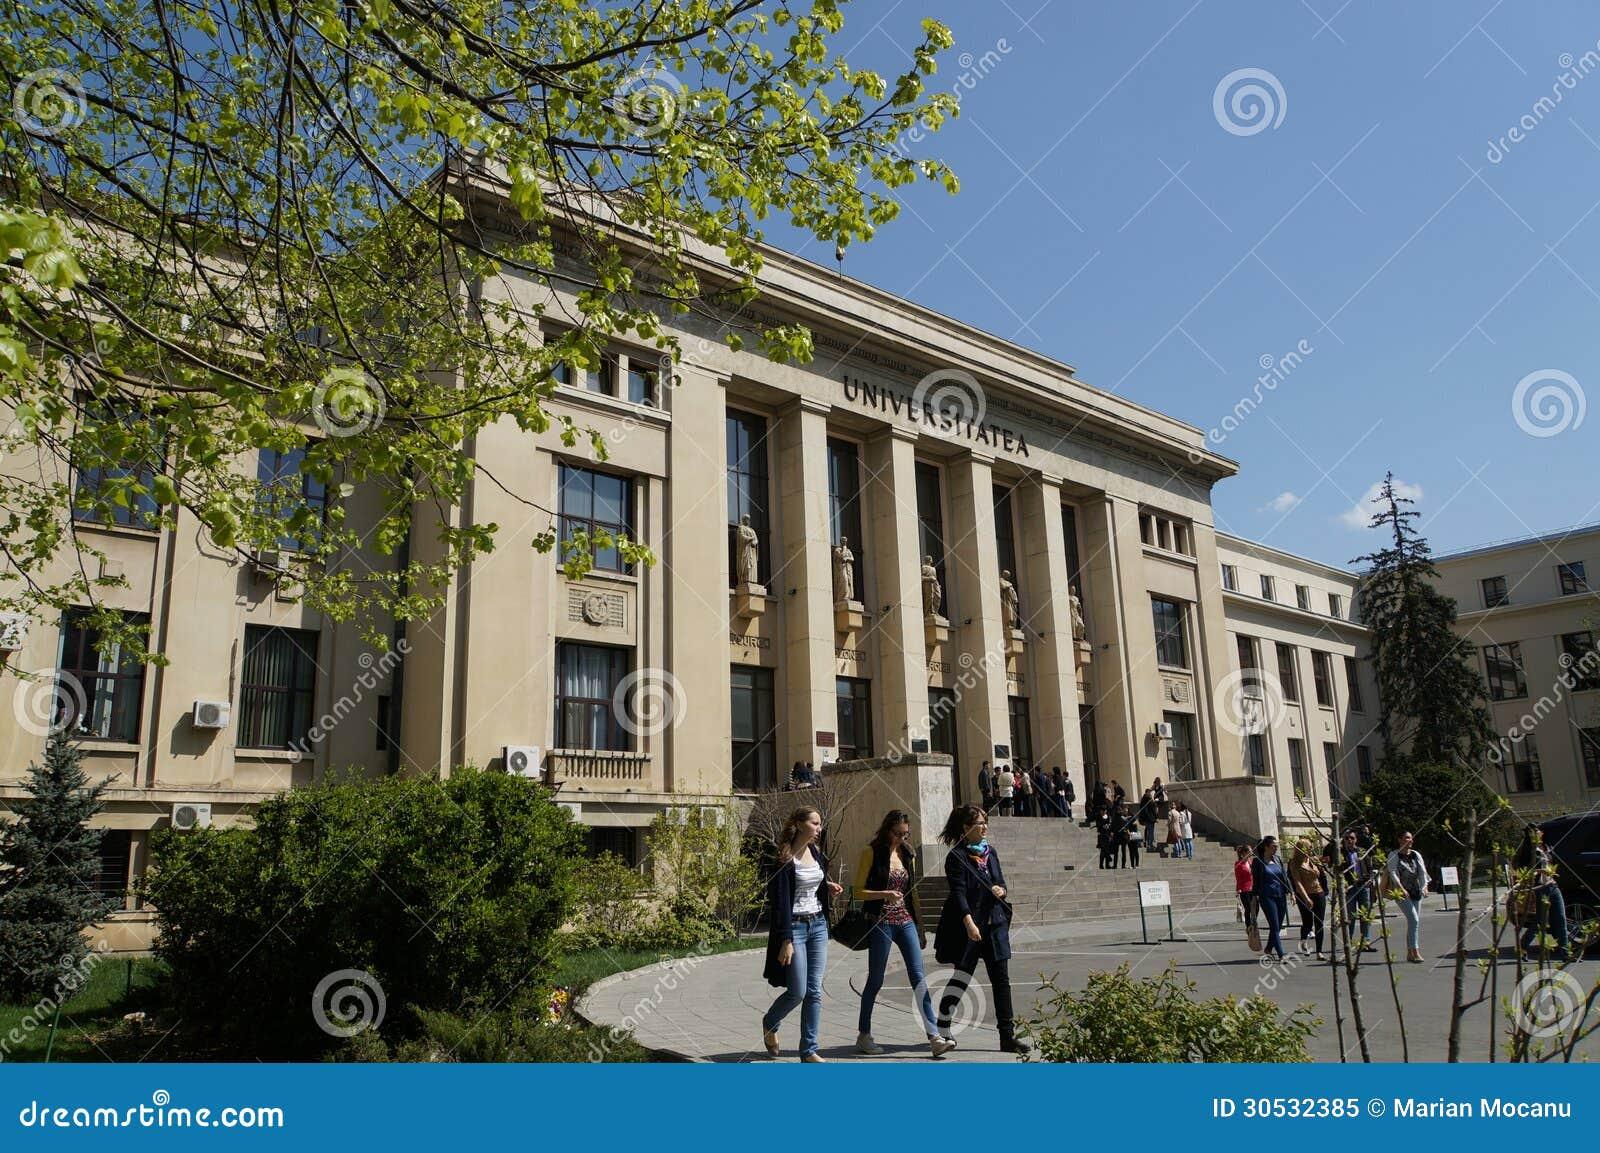 the law school university editorial image image 30532385